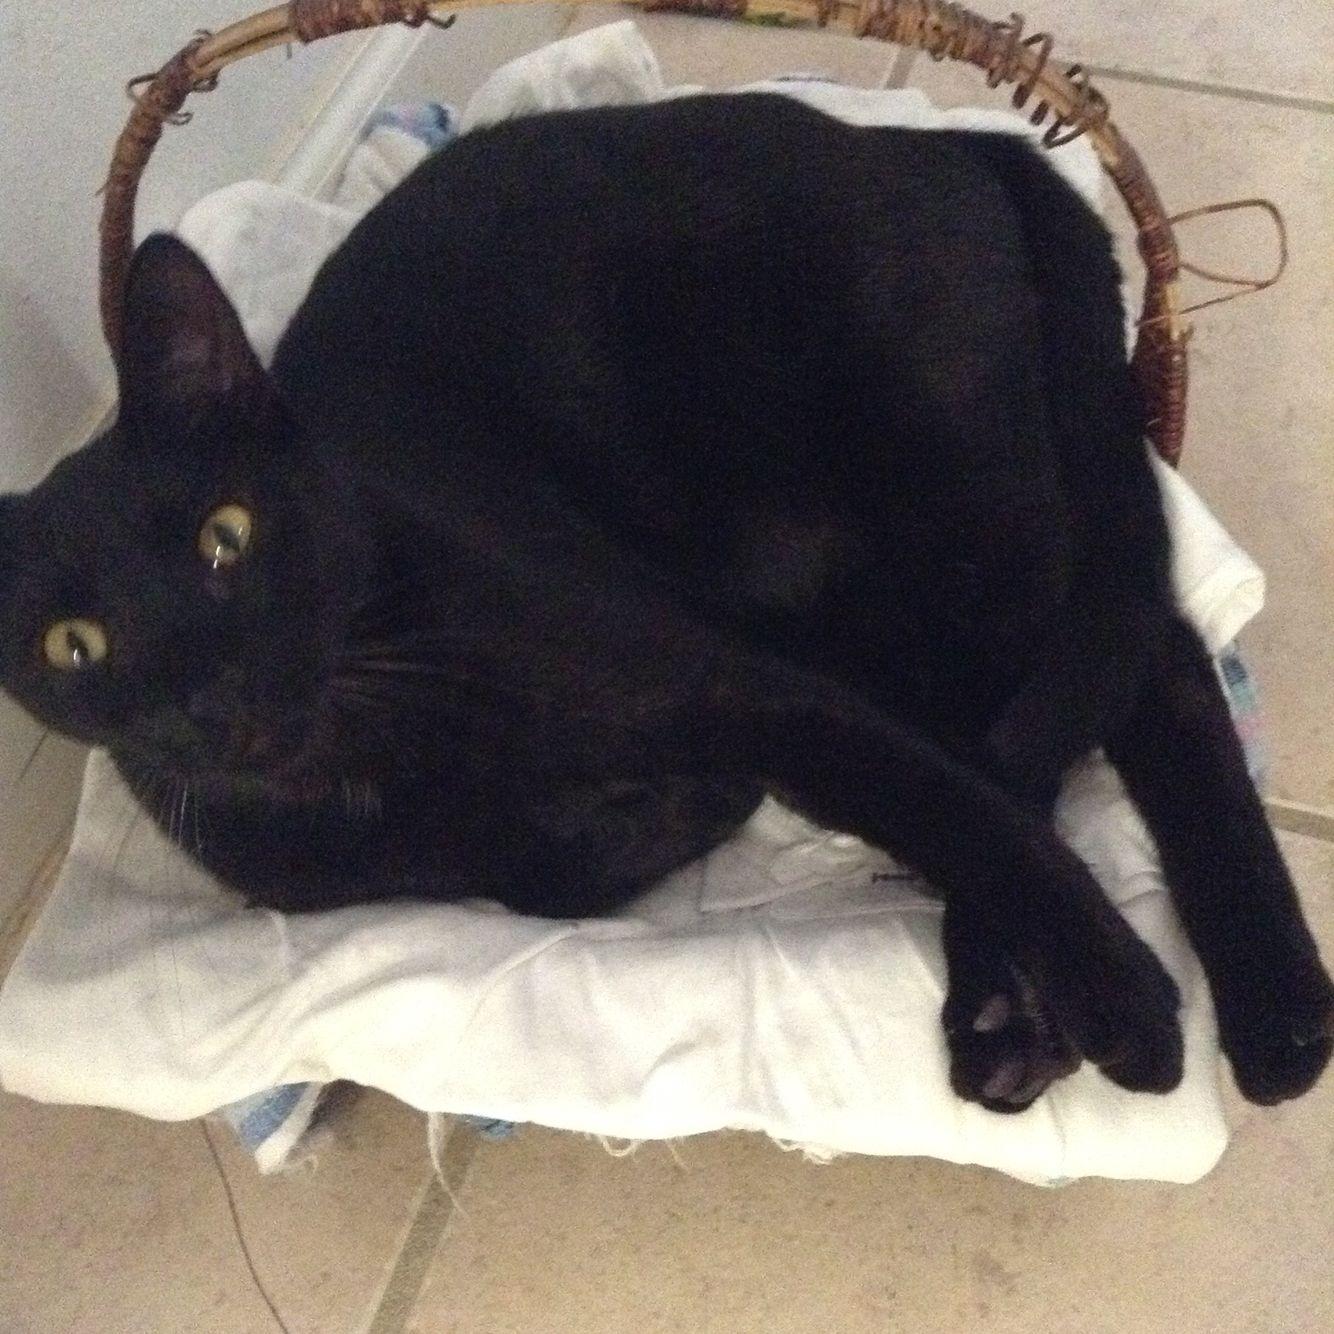 Blackie in a basket